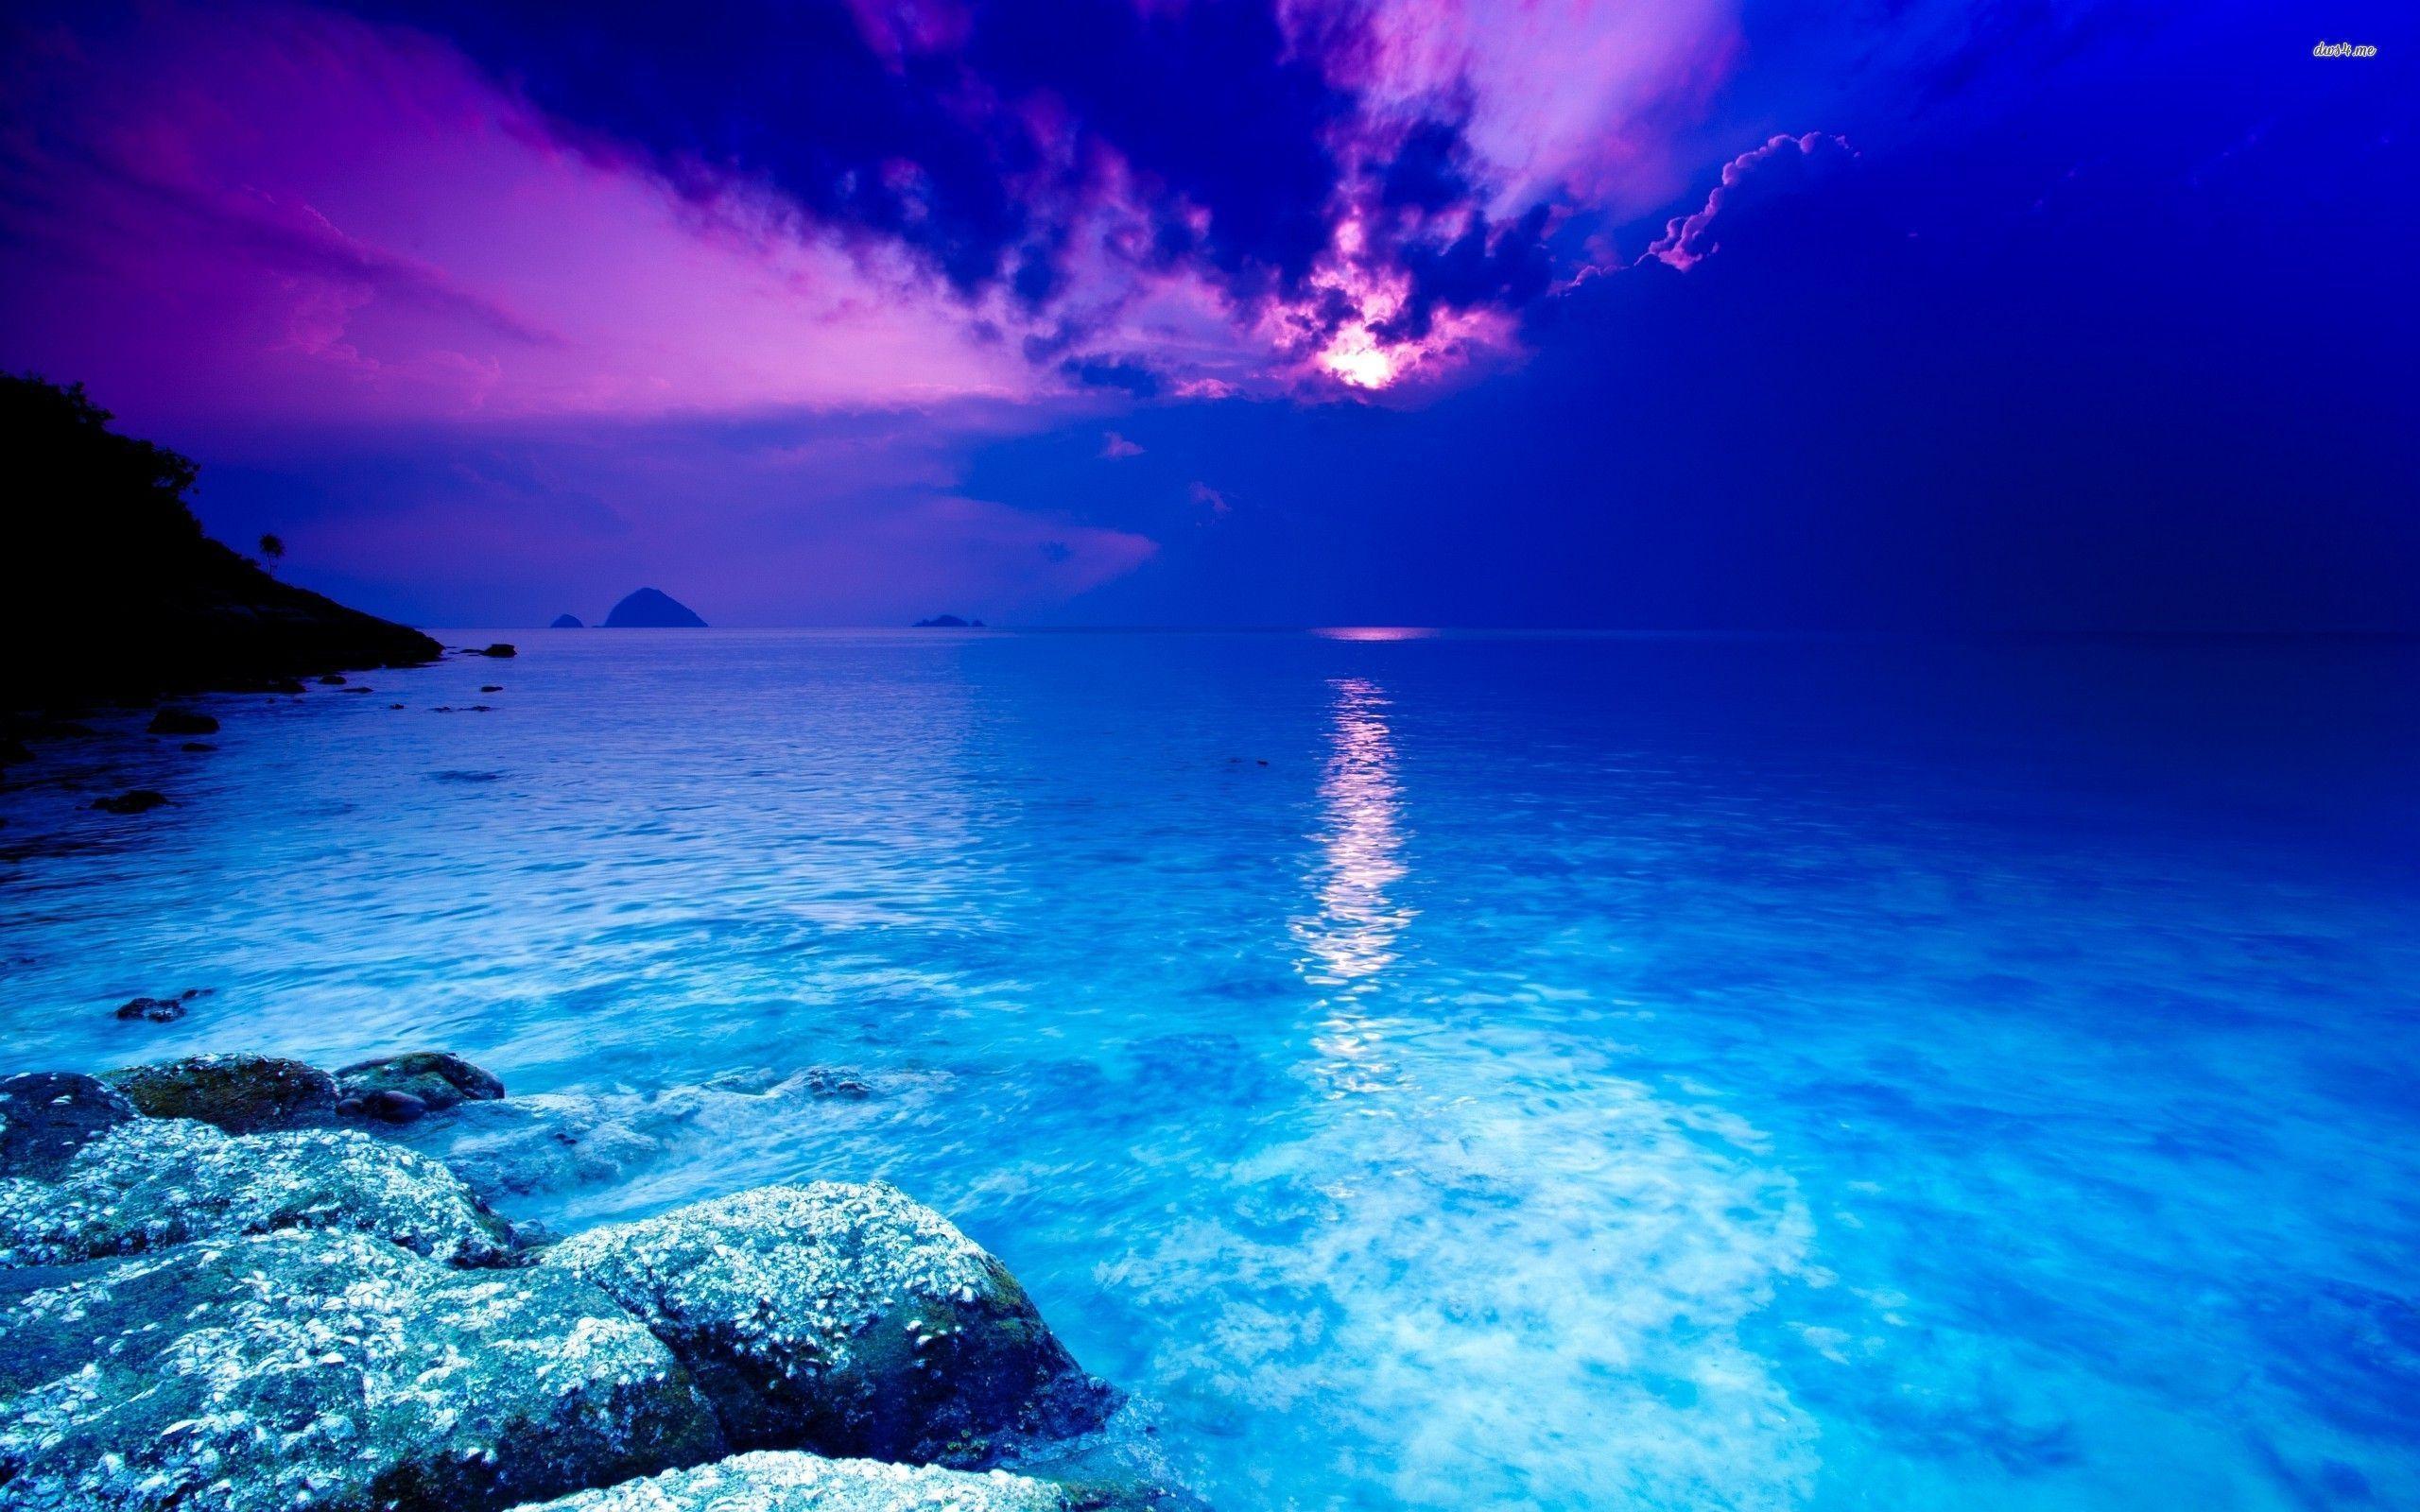 blue ocean clouds scenic - photo #24